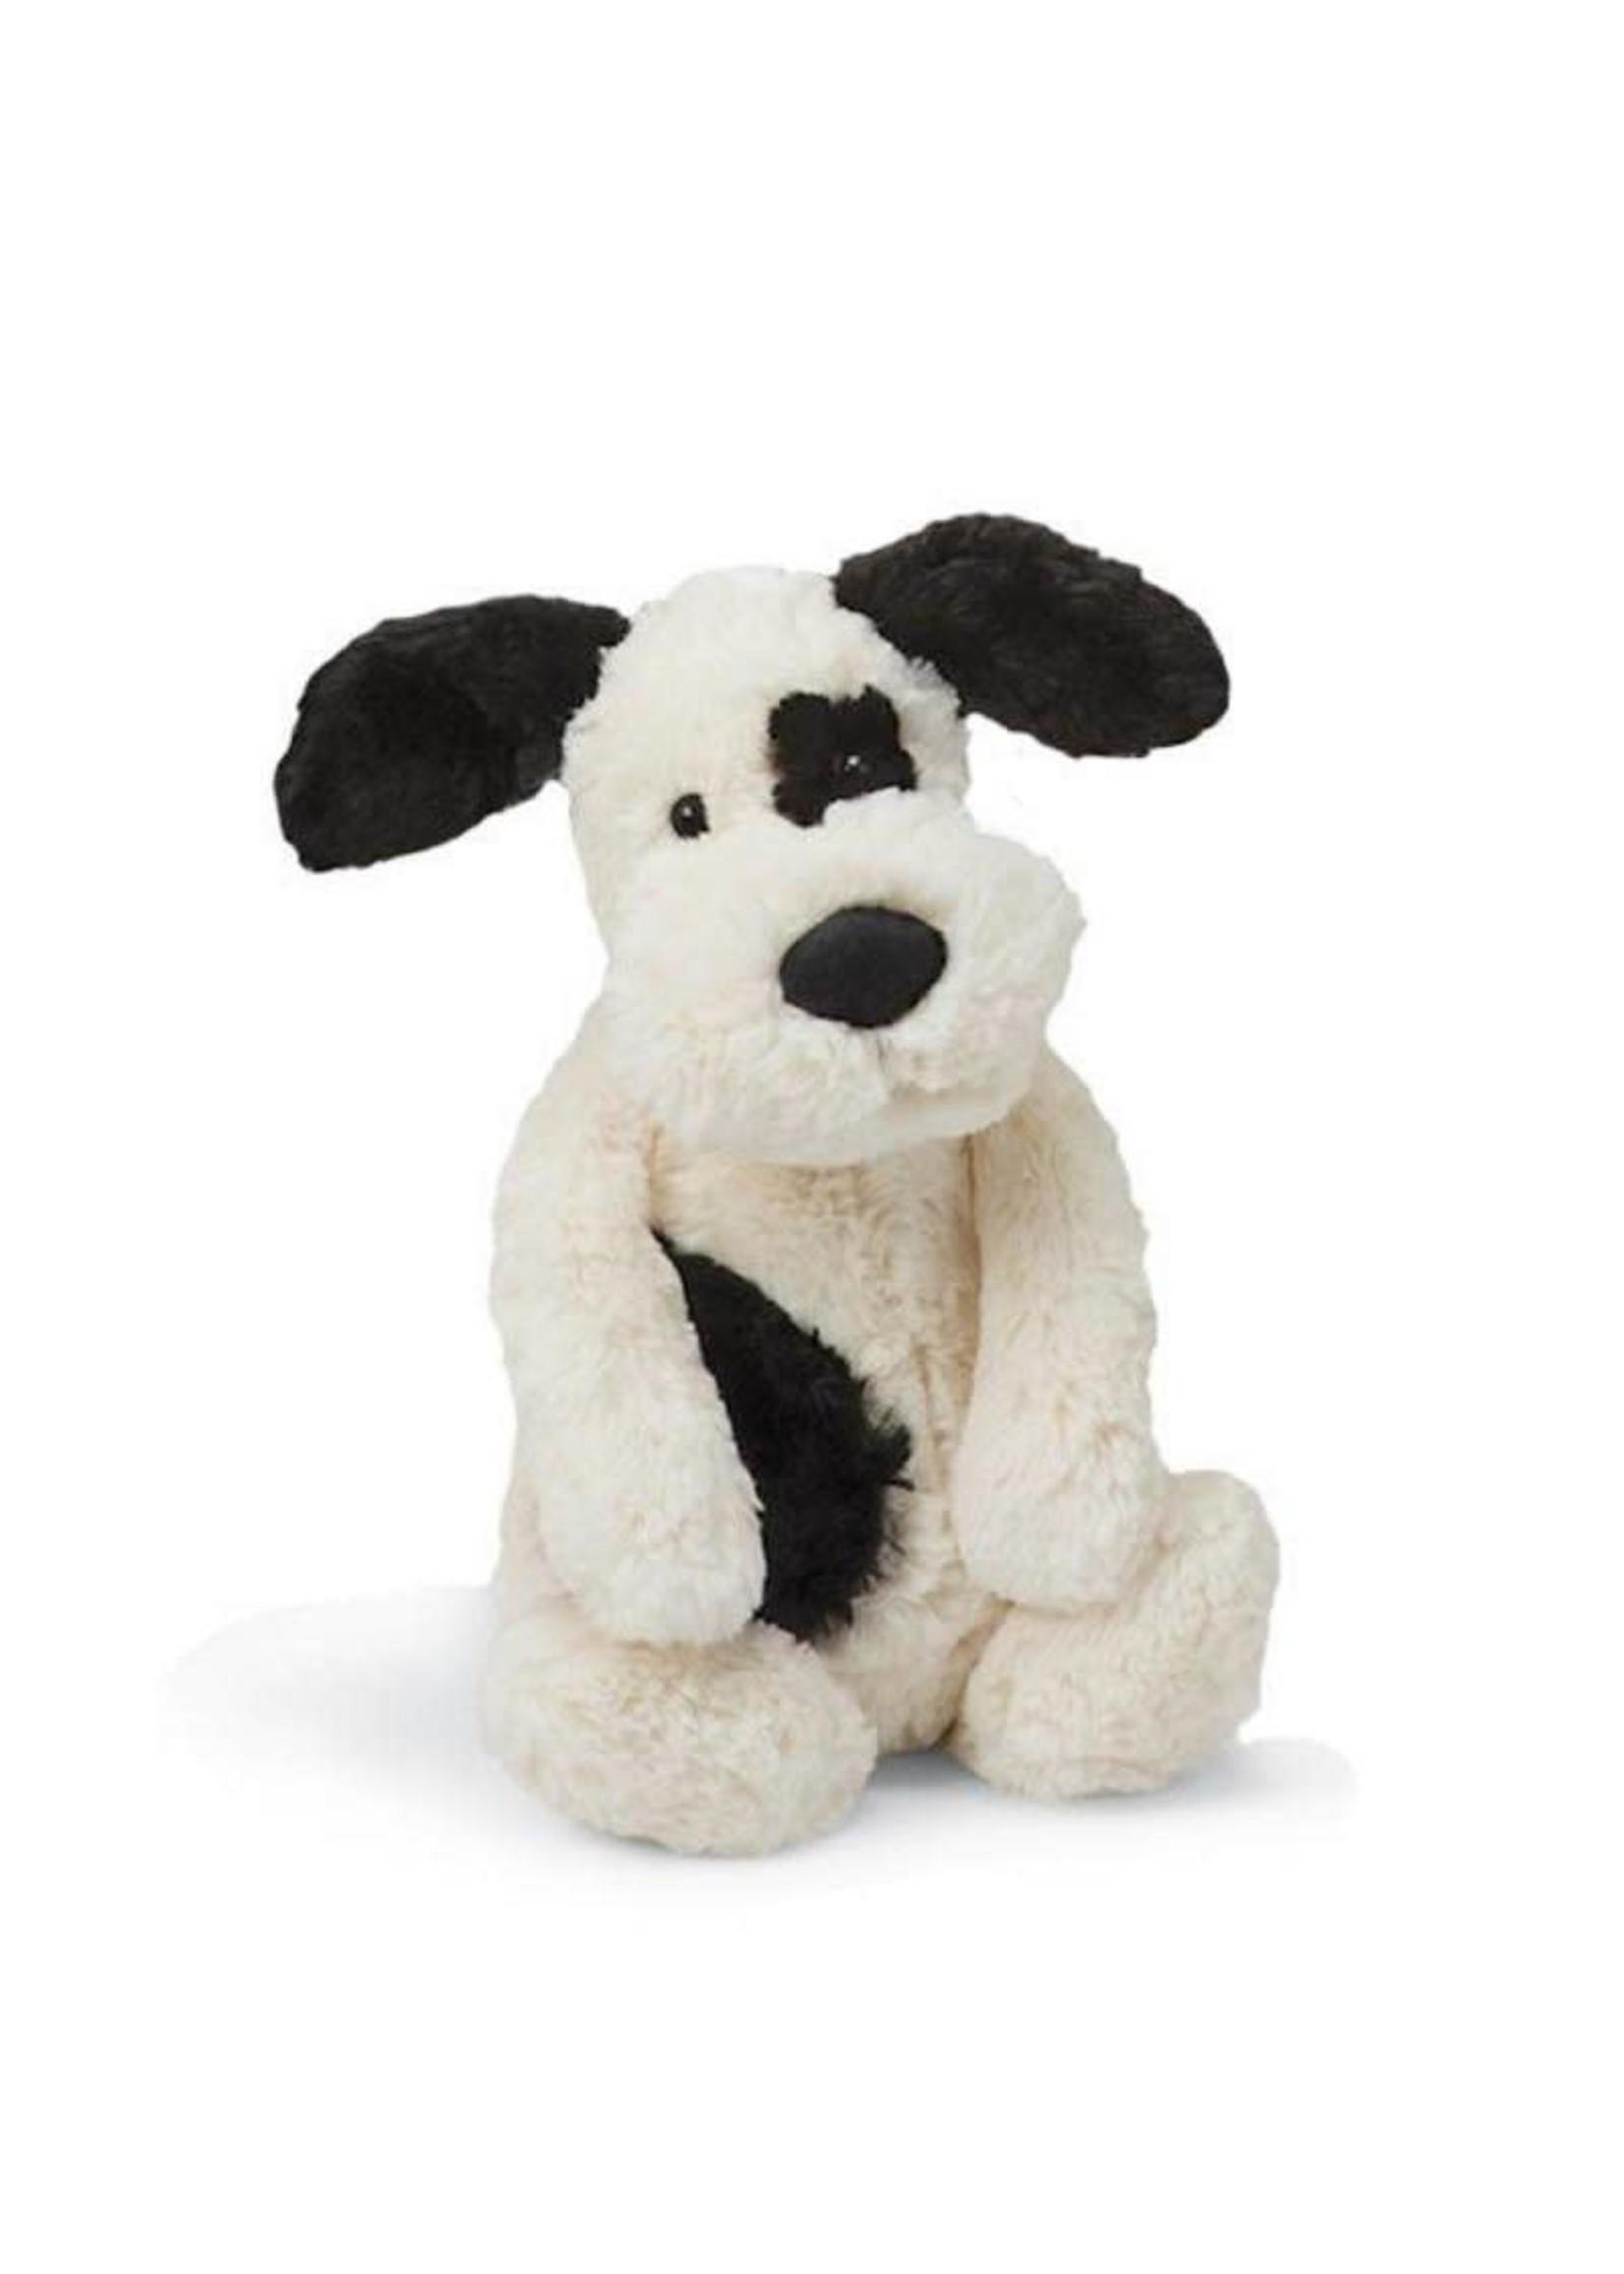 Jellycat JC Medium Bashful Blk/Cream Puppy